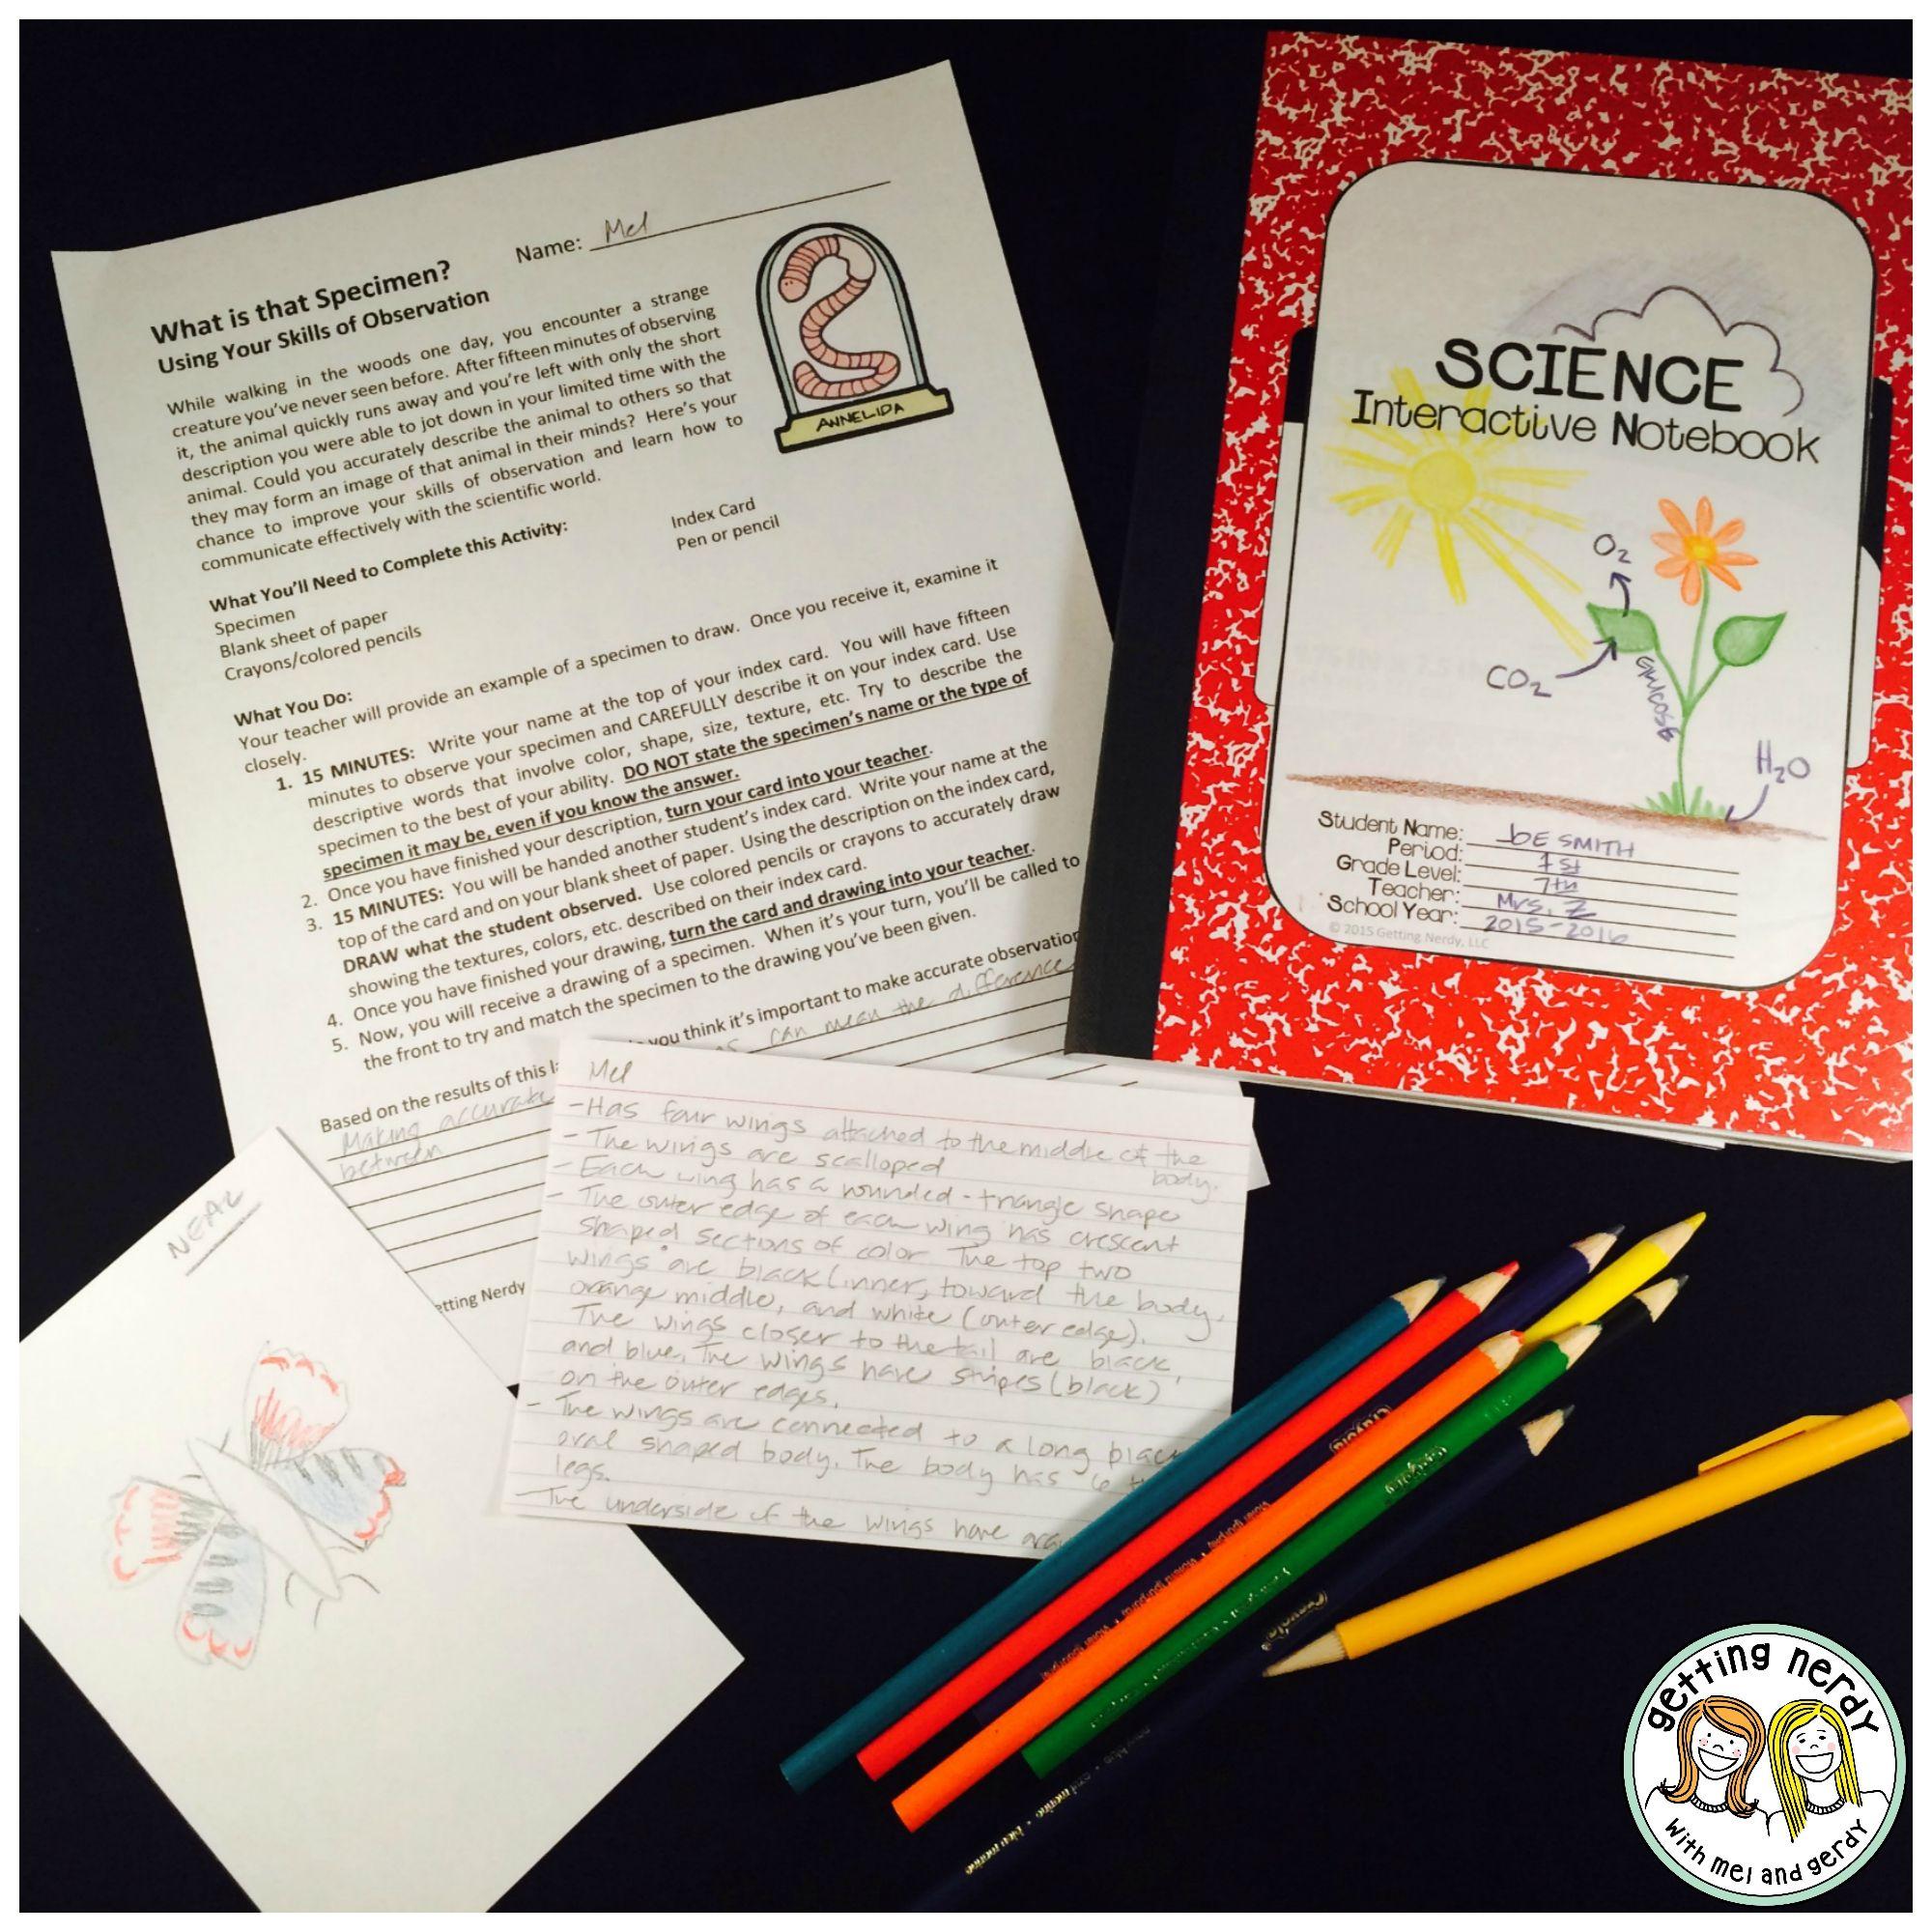 Teacher Tools Refresher Course In The Scientific Method